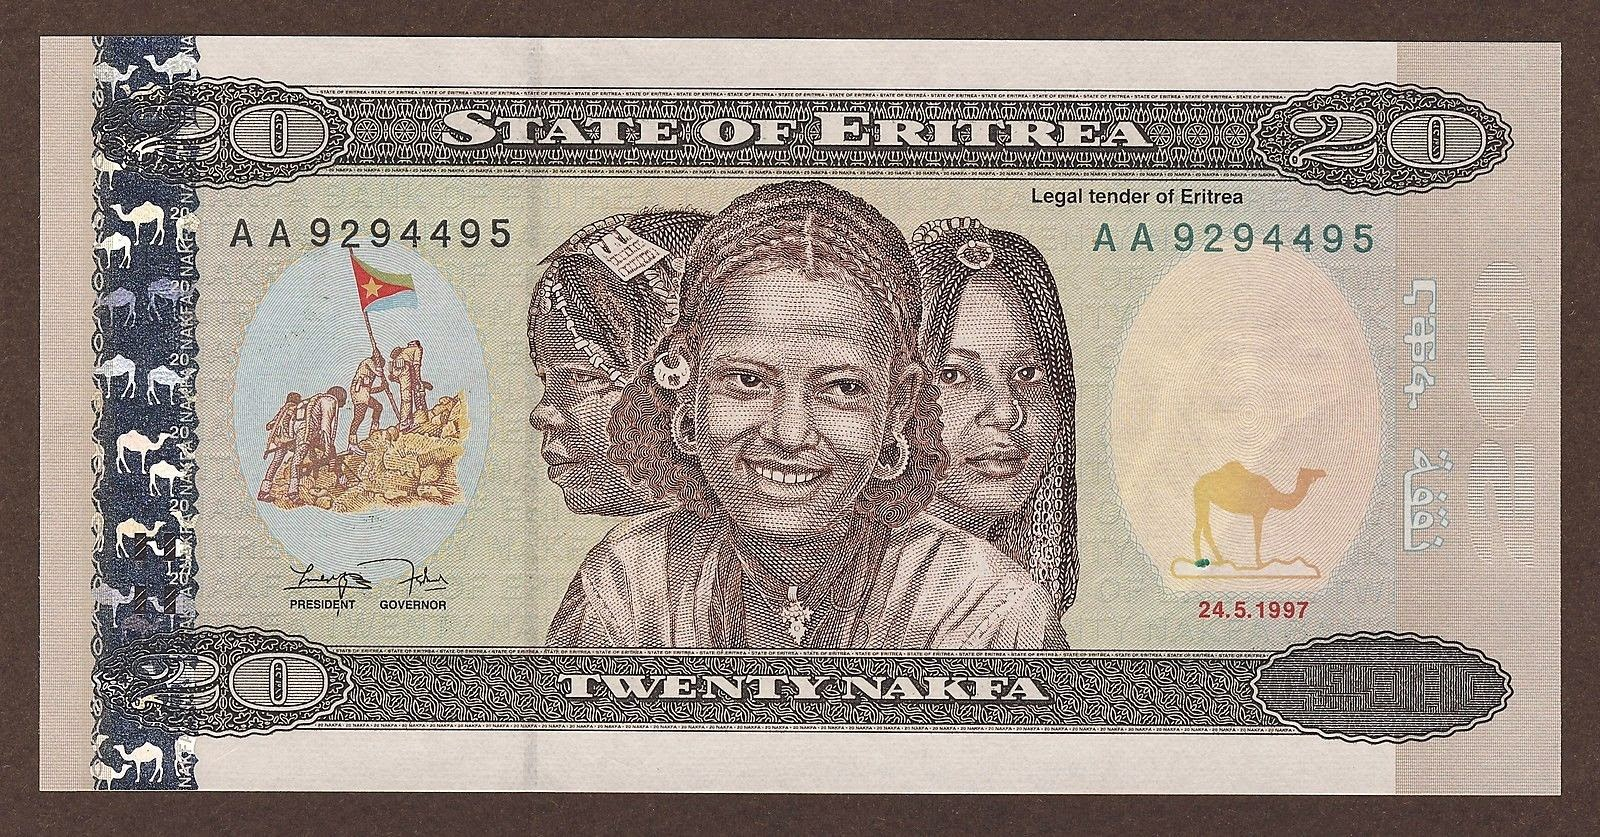 Eritrea banknotes 20 Eritrean nakfa note